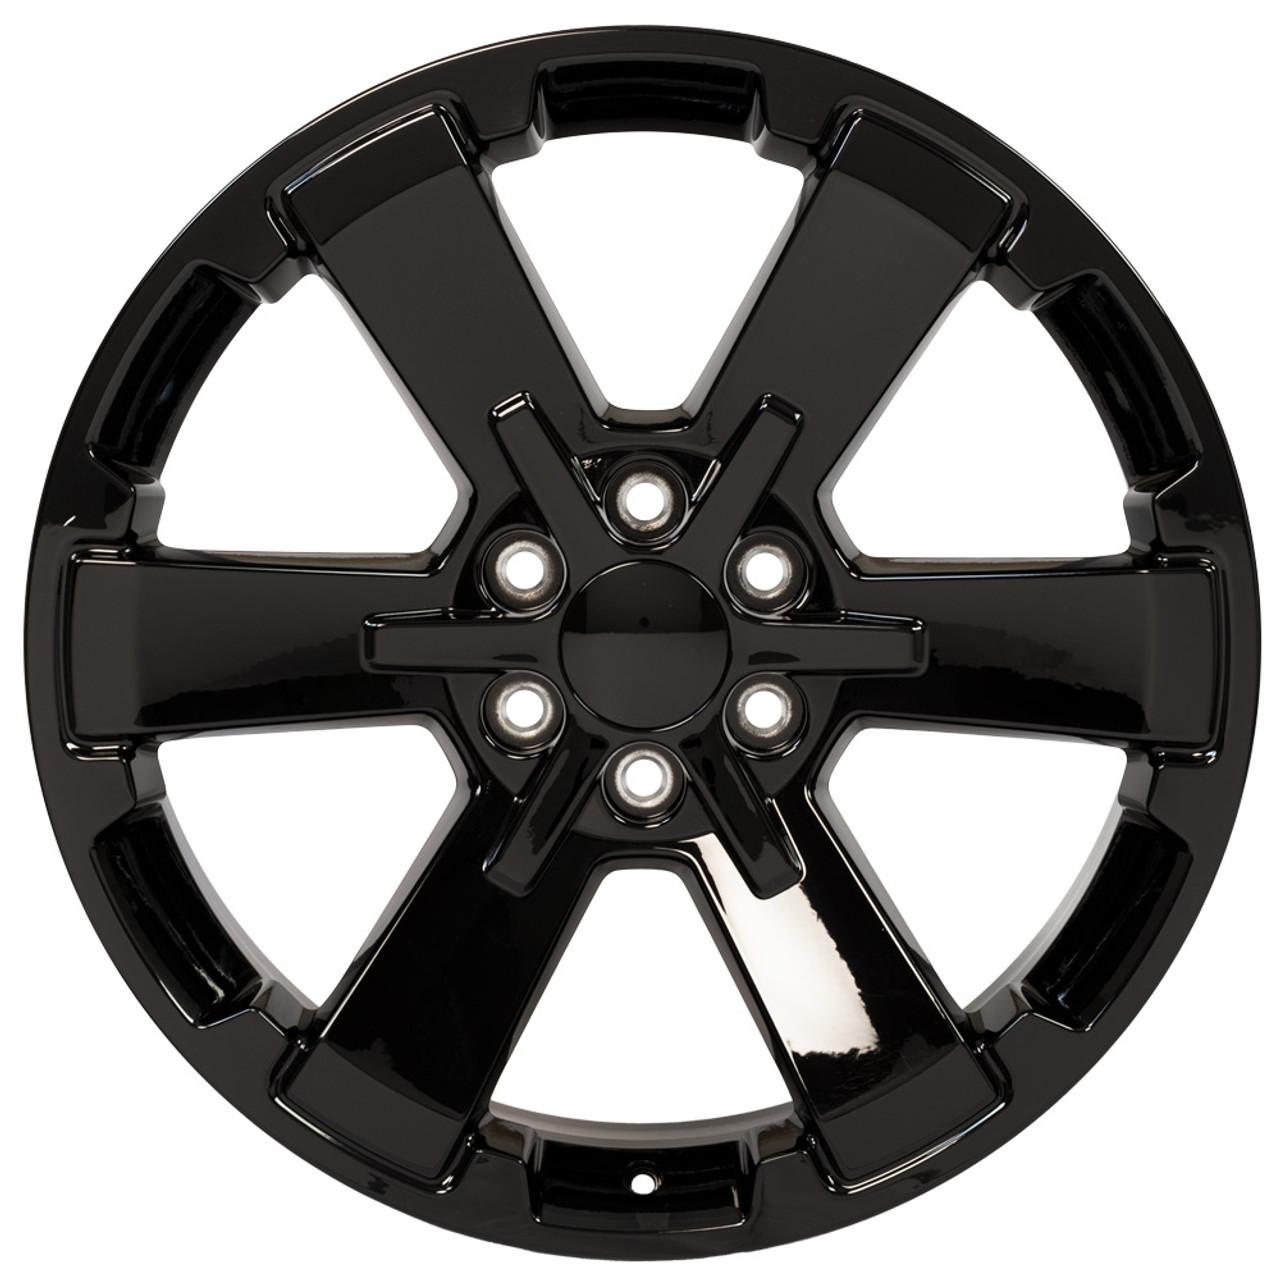 22 Fits Chevy 1500 Midnight Wheel Gloss Black Rally Gmc Yukon Denali Ck162 22x9 Rim Stock Wheel Solutions